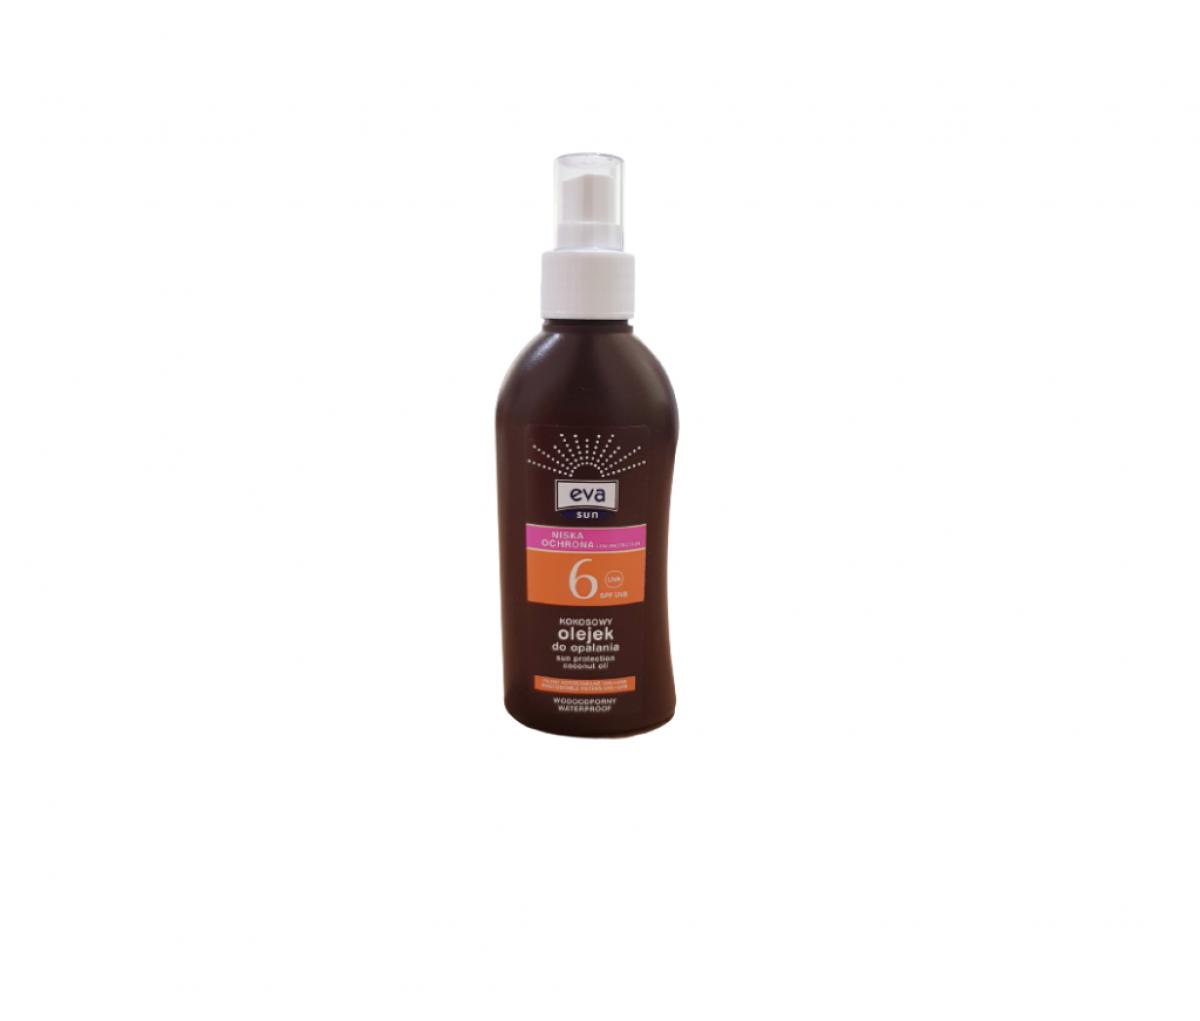 TZMO-EVA Sun SPF 6 Sun Protection Coconut Oil 150ml